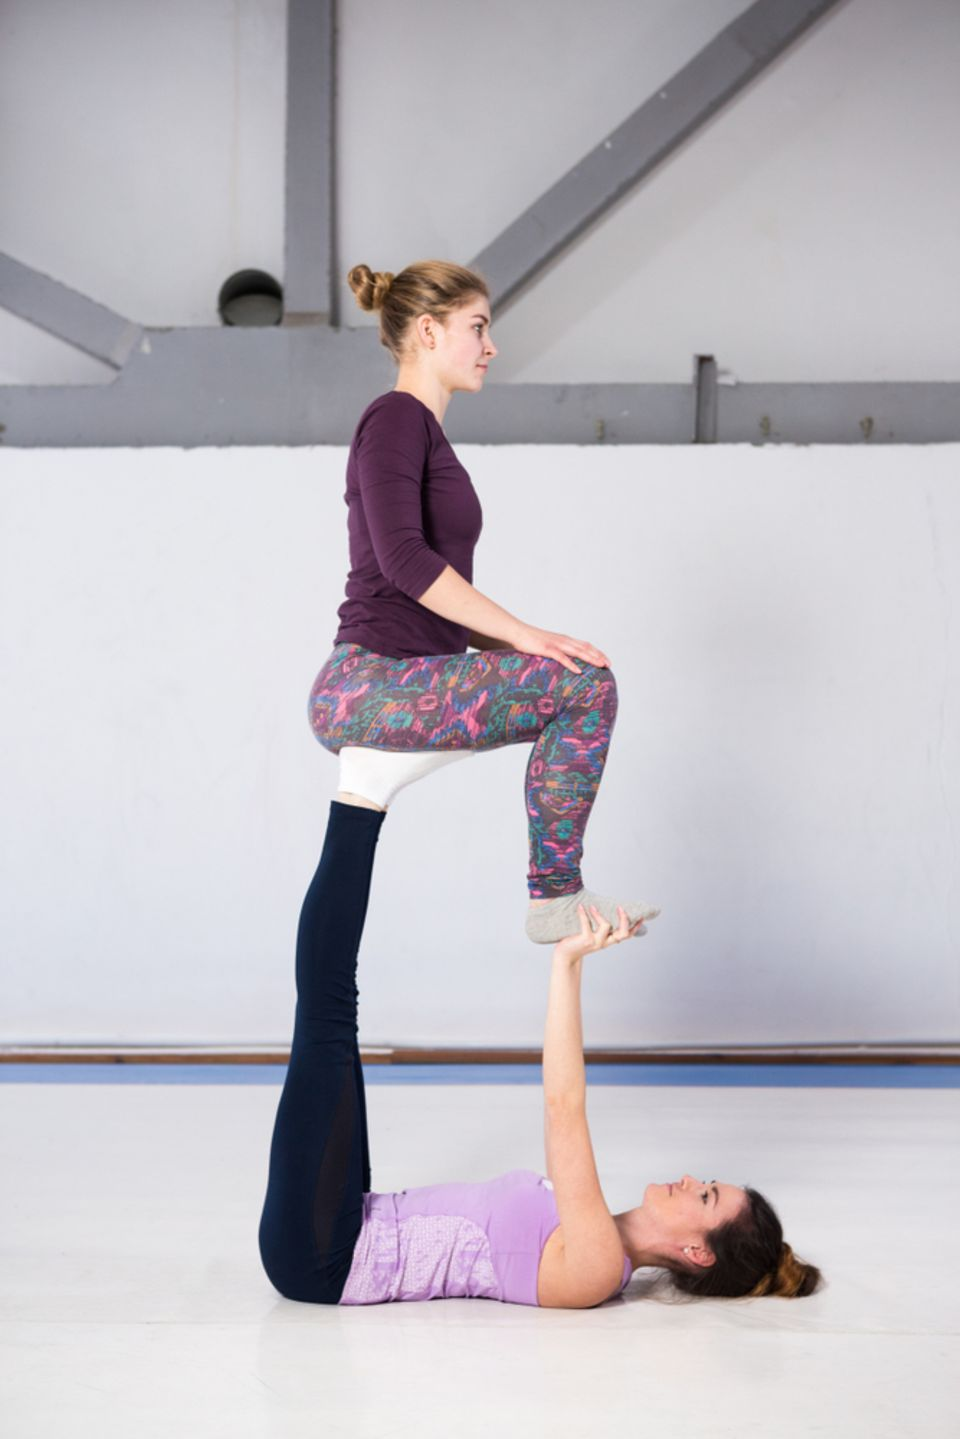 Acro Yoga: Throne